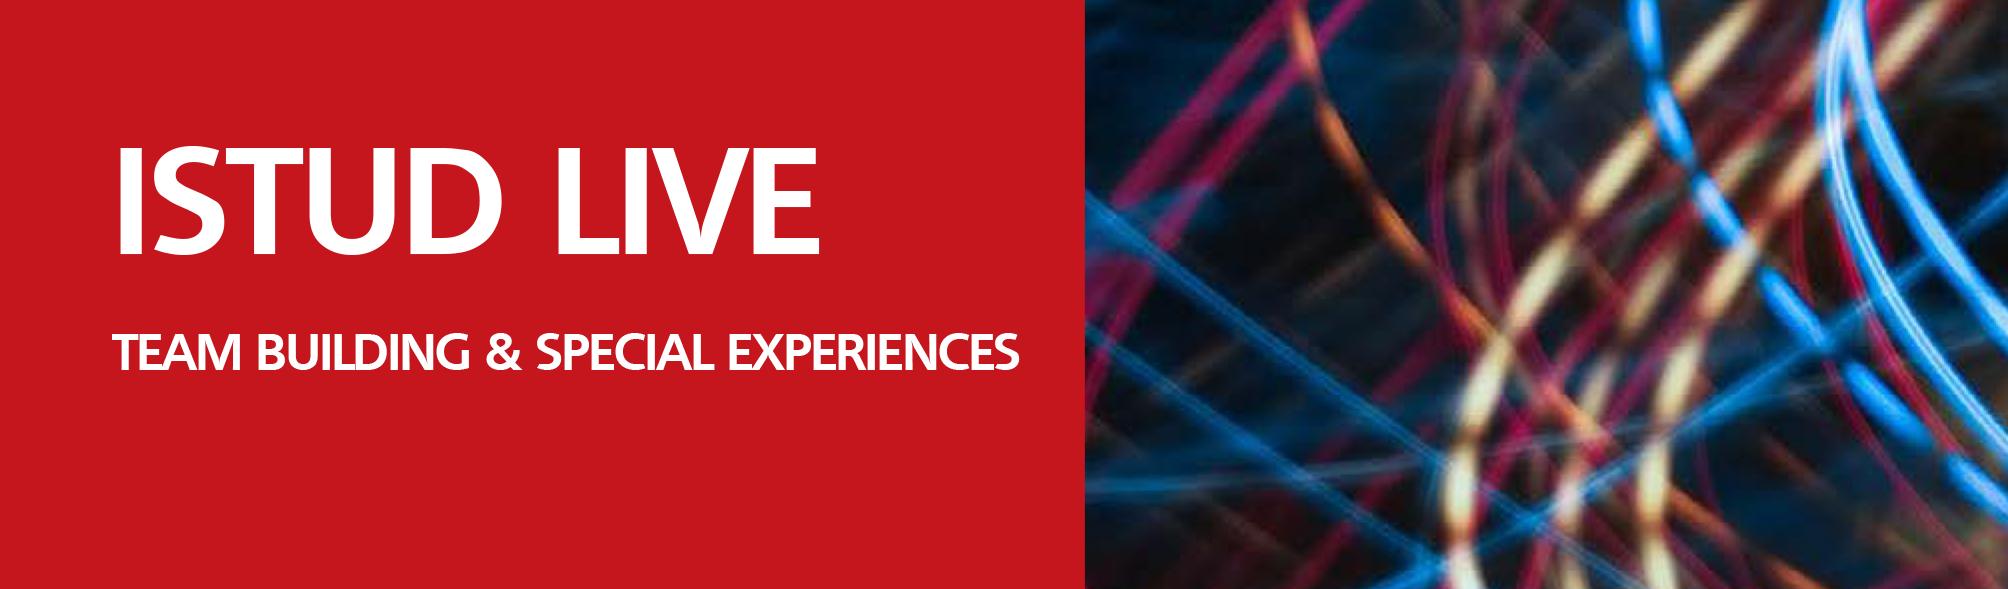 istud live - eventi e meeting aziendali